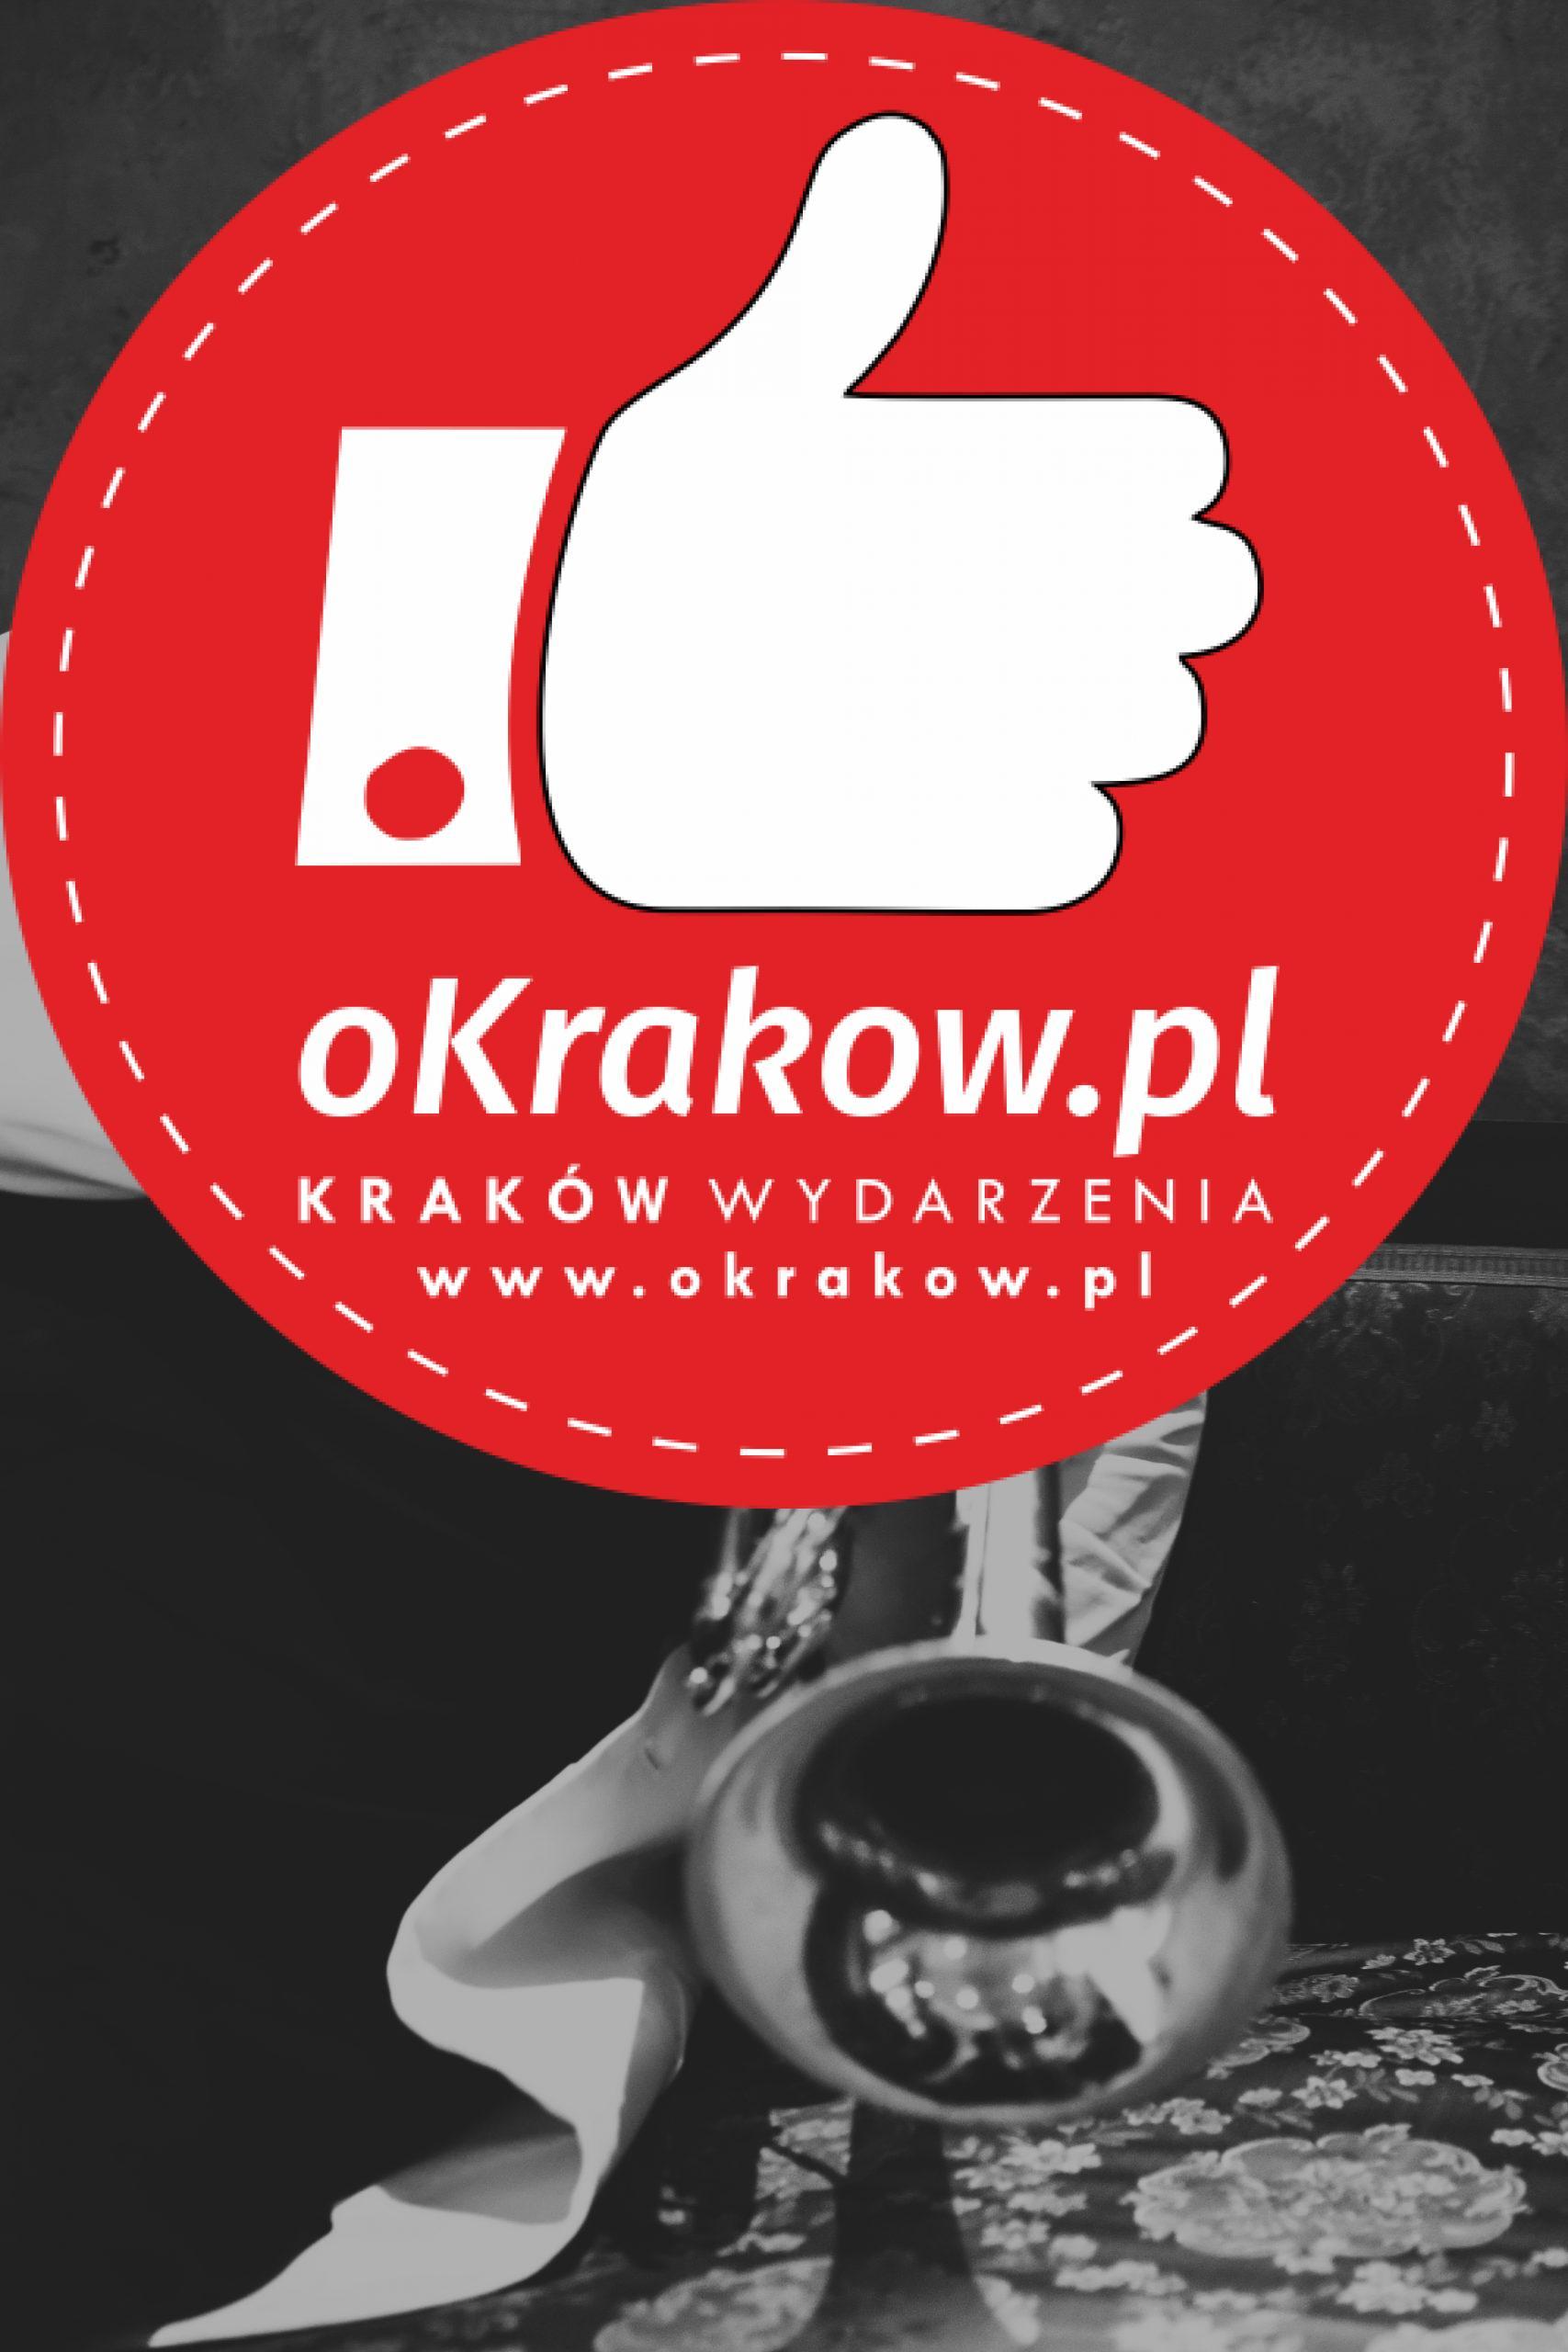 pan 45 scaled - Piotr Krakowski gra w Camera Cafe